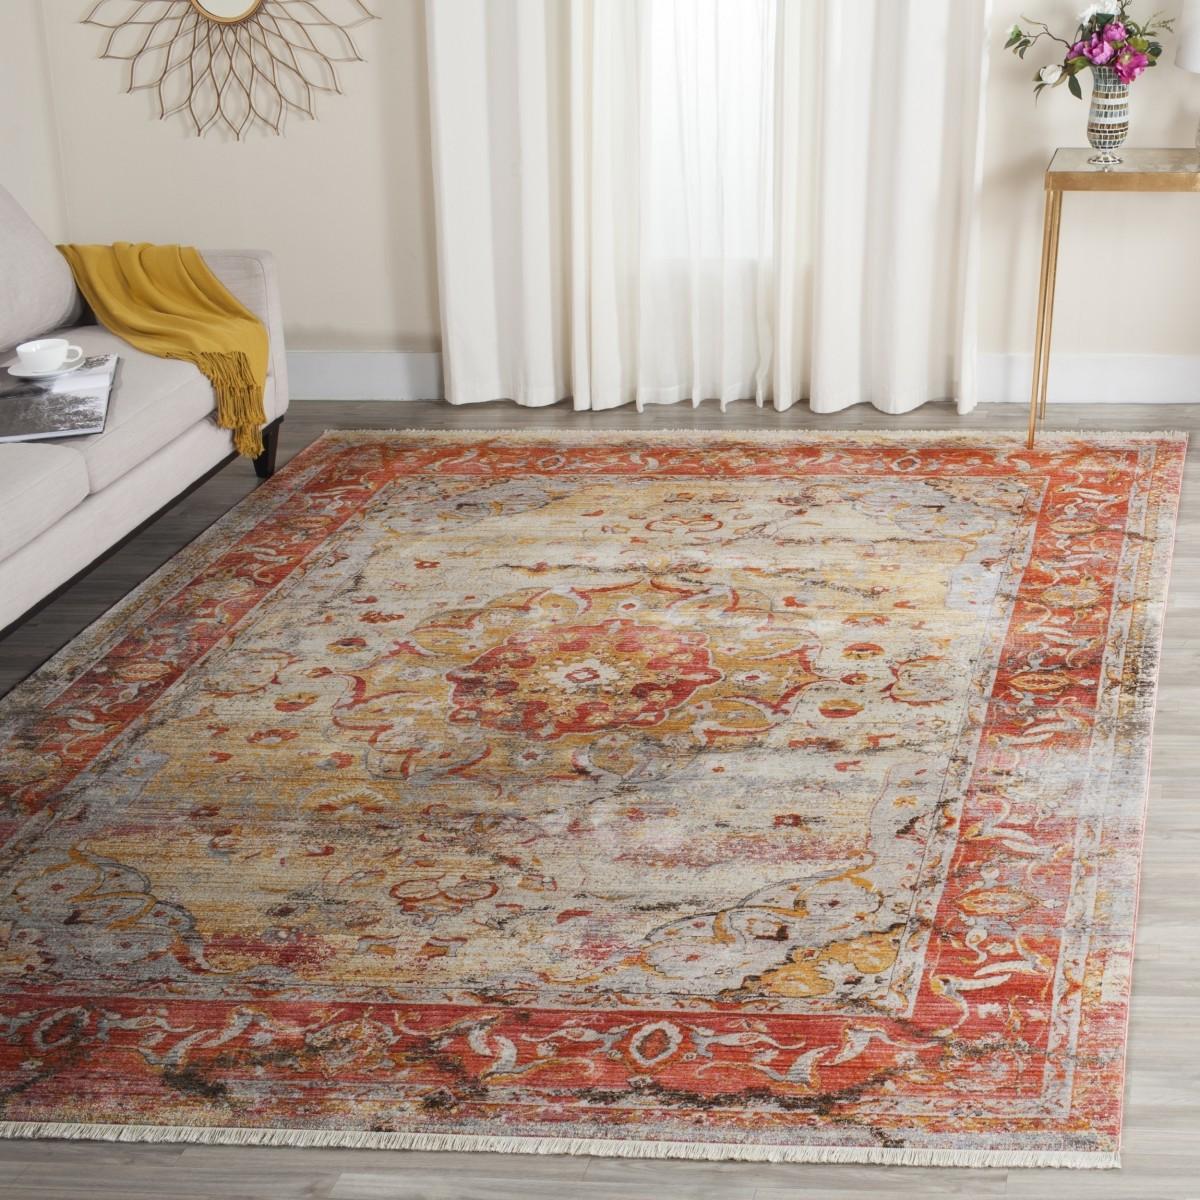 Safavieh-Vintage-Persian-Pink-Multi-Polyester-Rug-8-x-10-6c37ee24-6802-4965-8265-7f824bc06aa0